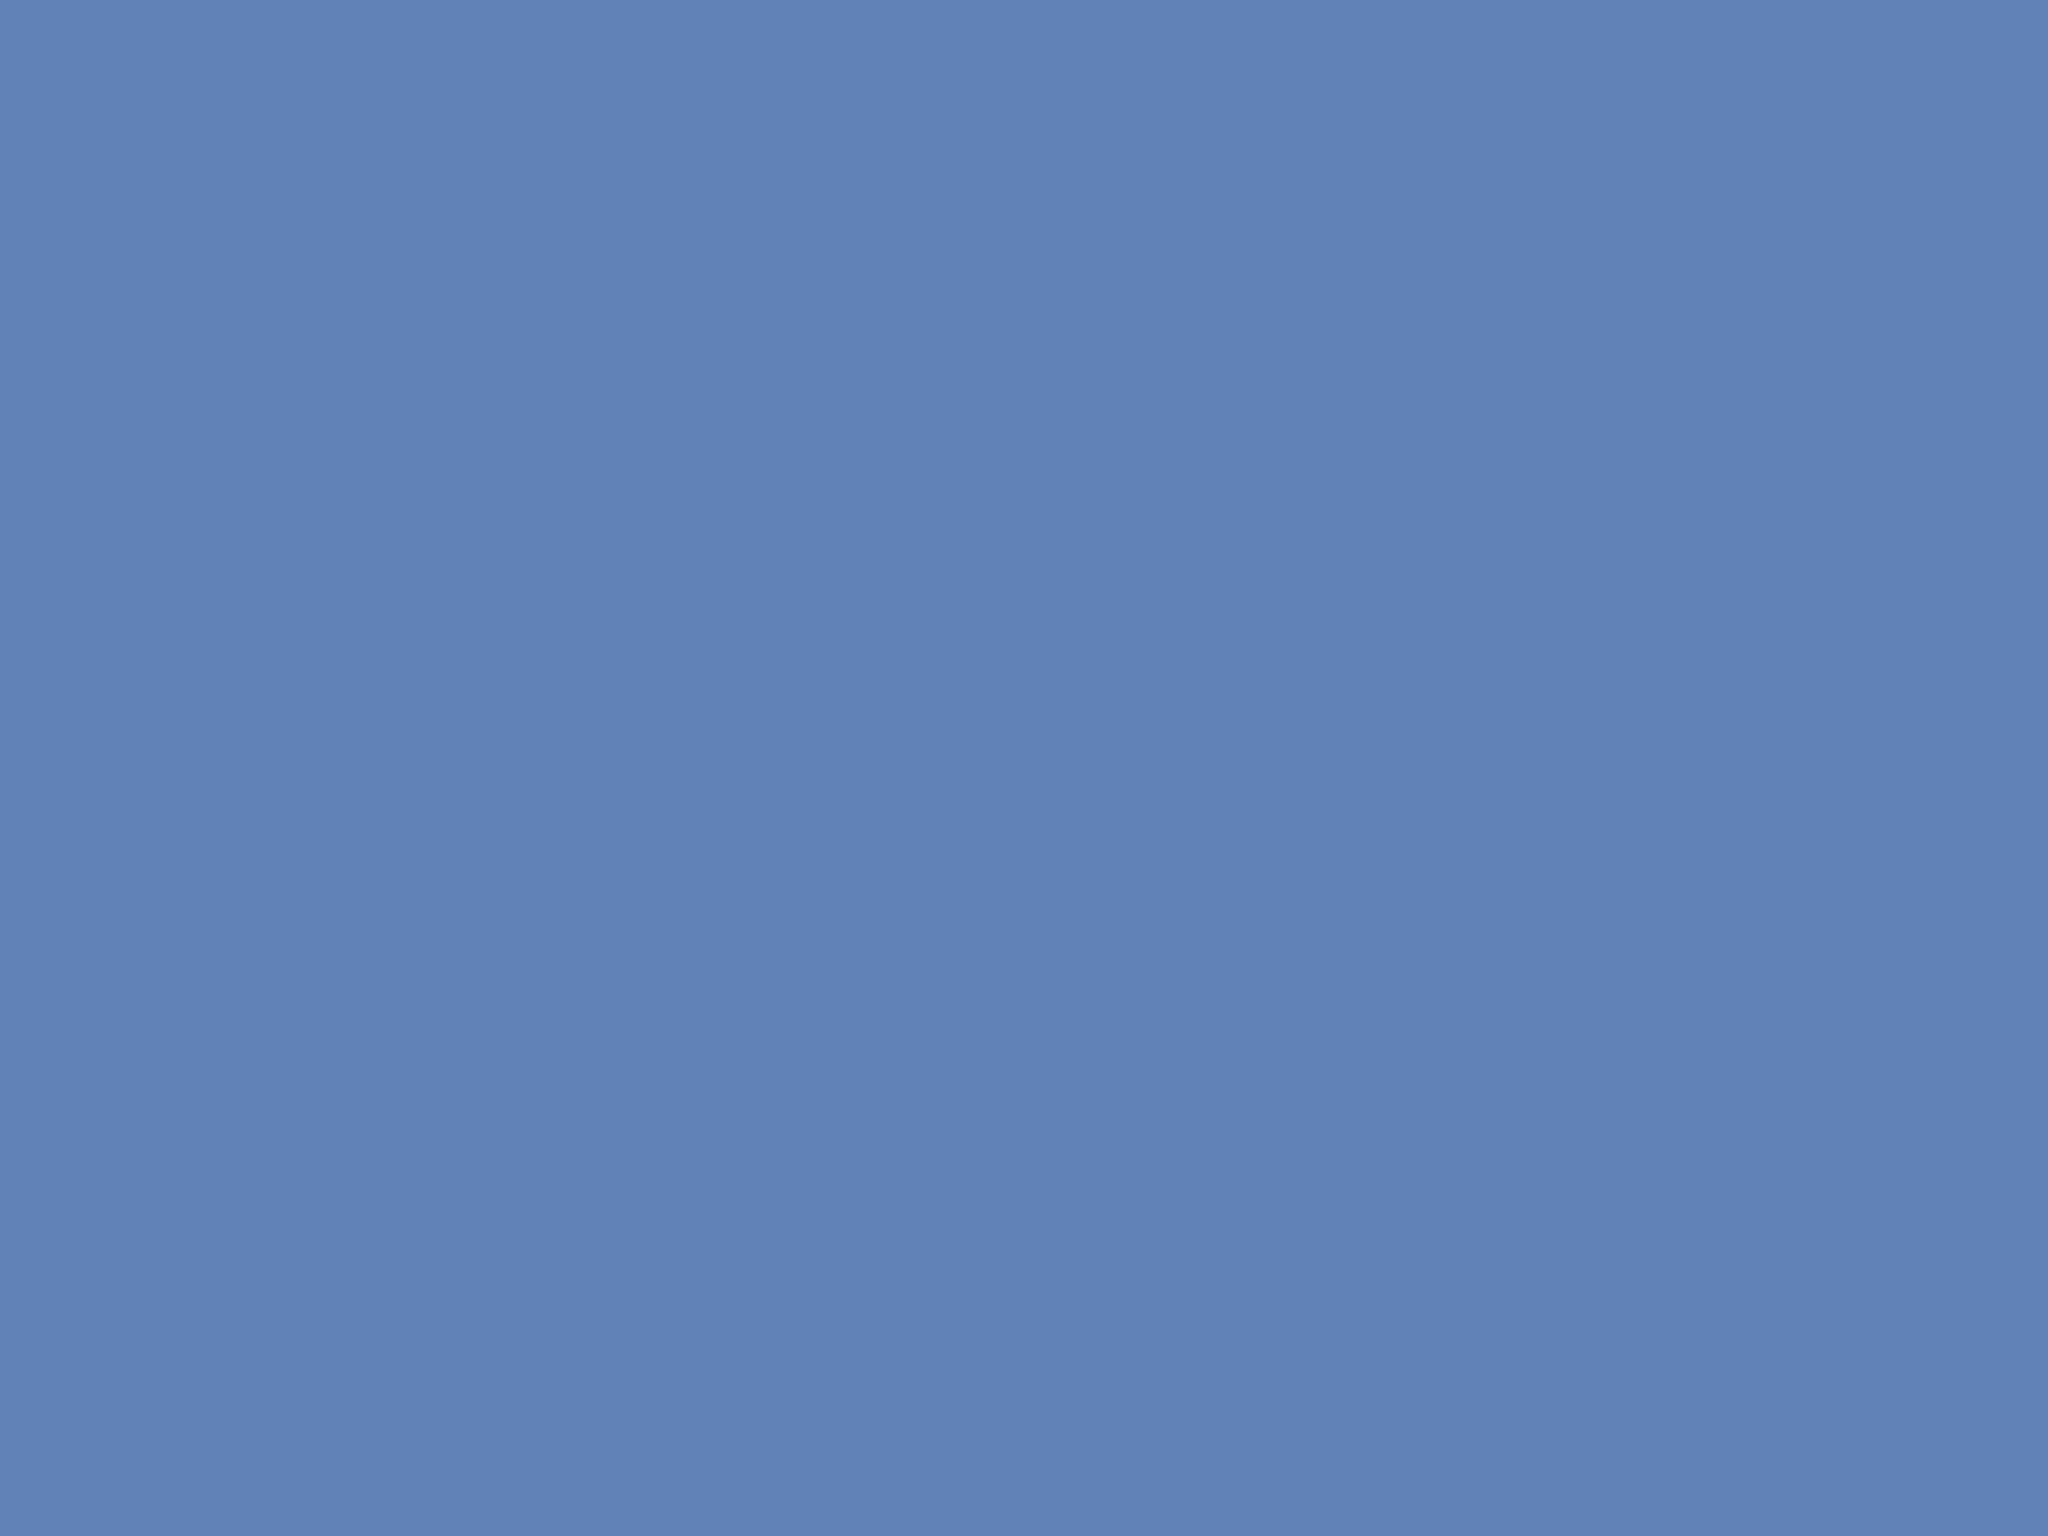 2048x1536 Glaucous Solid Color Background